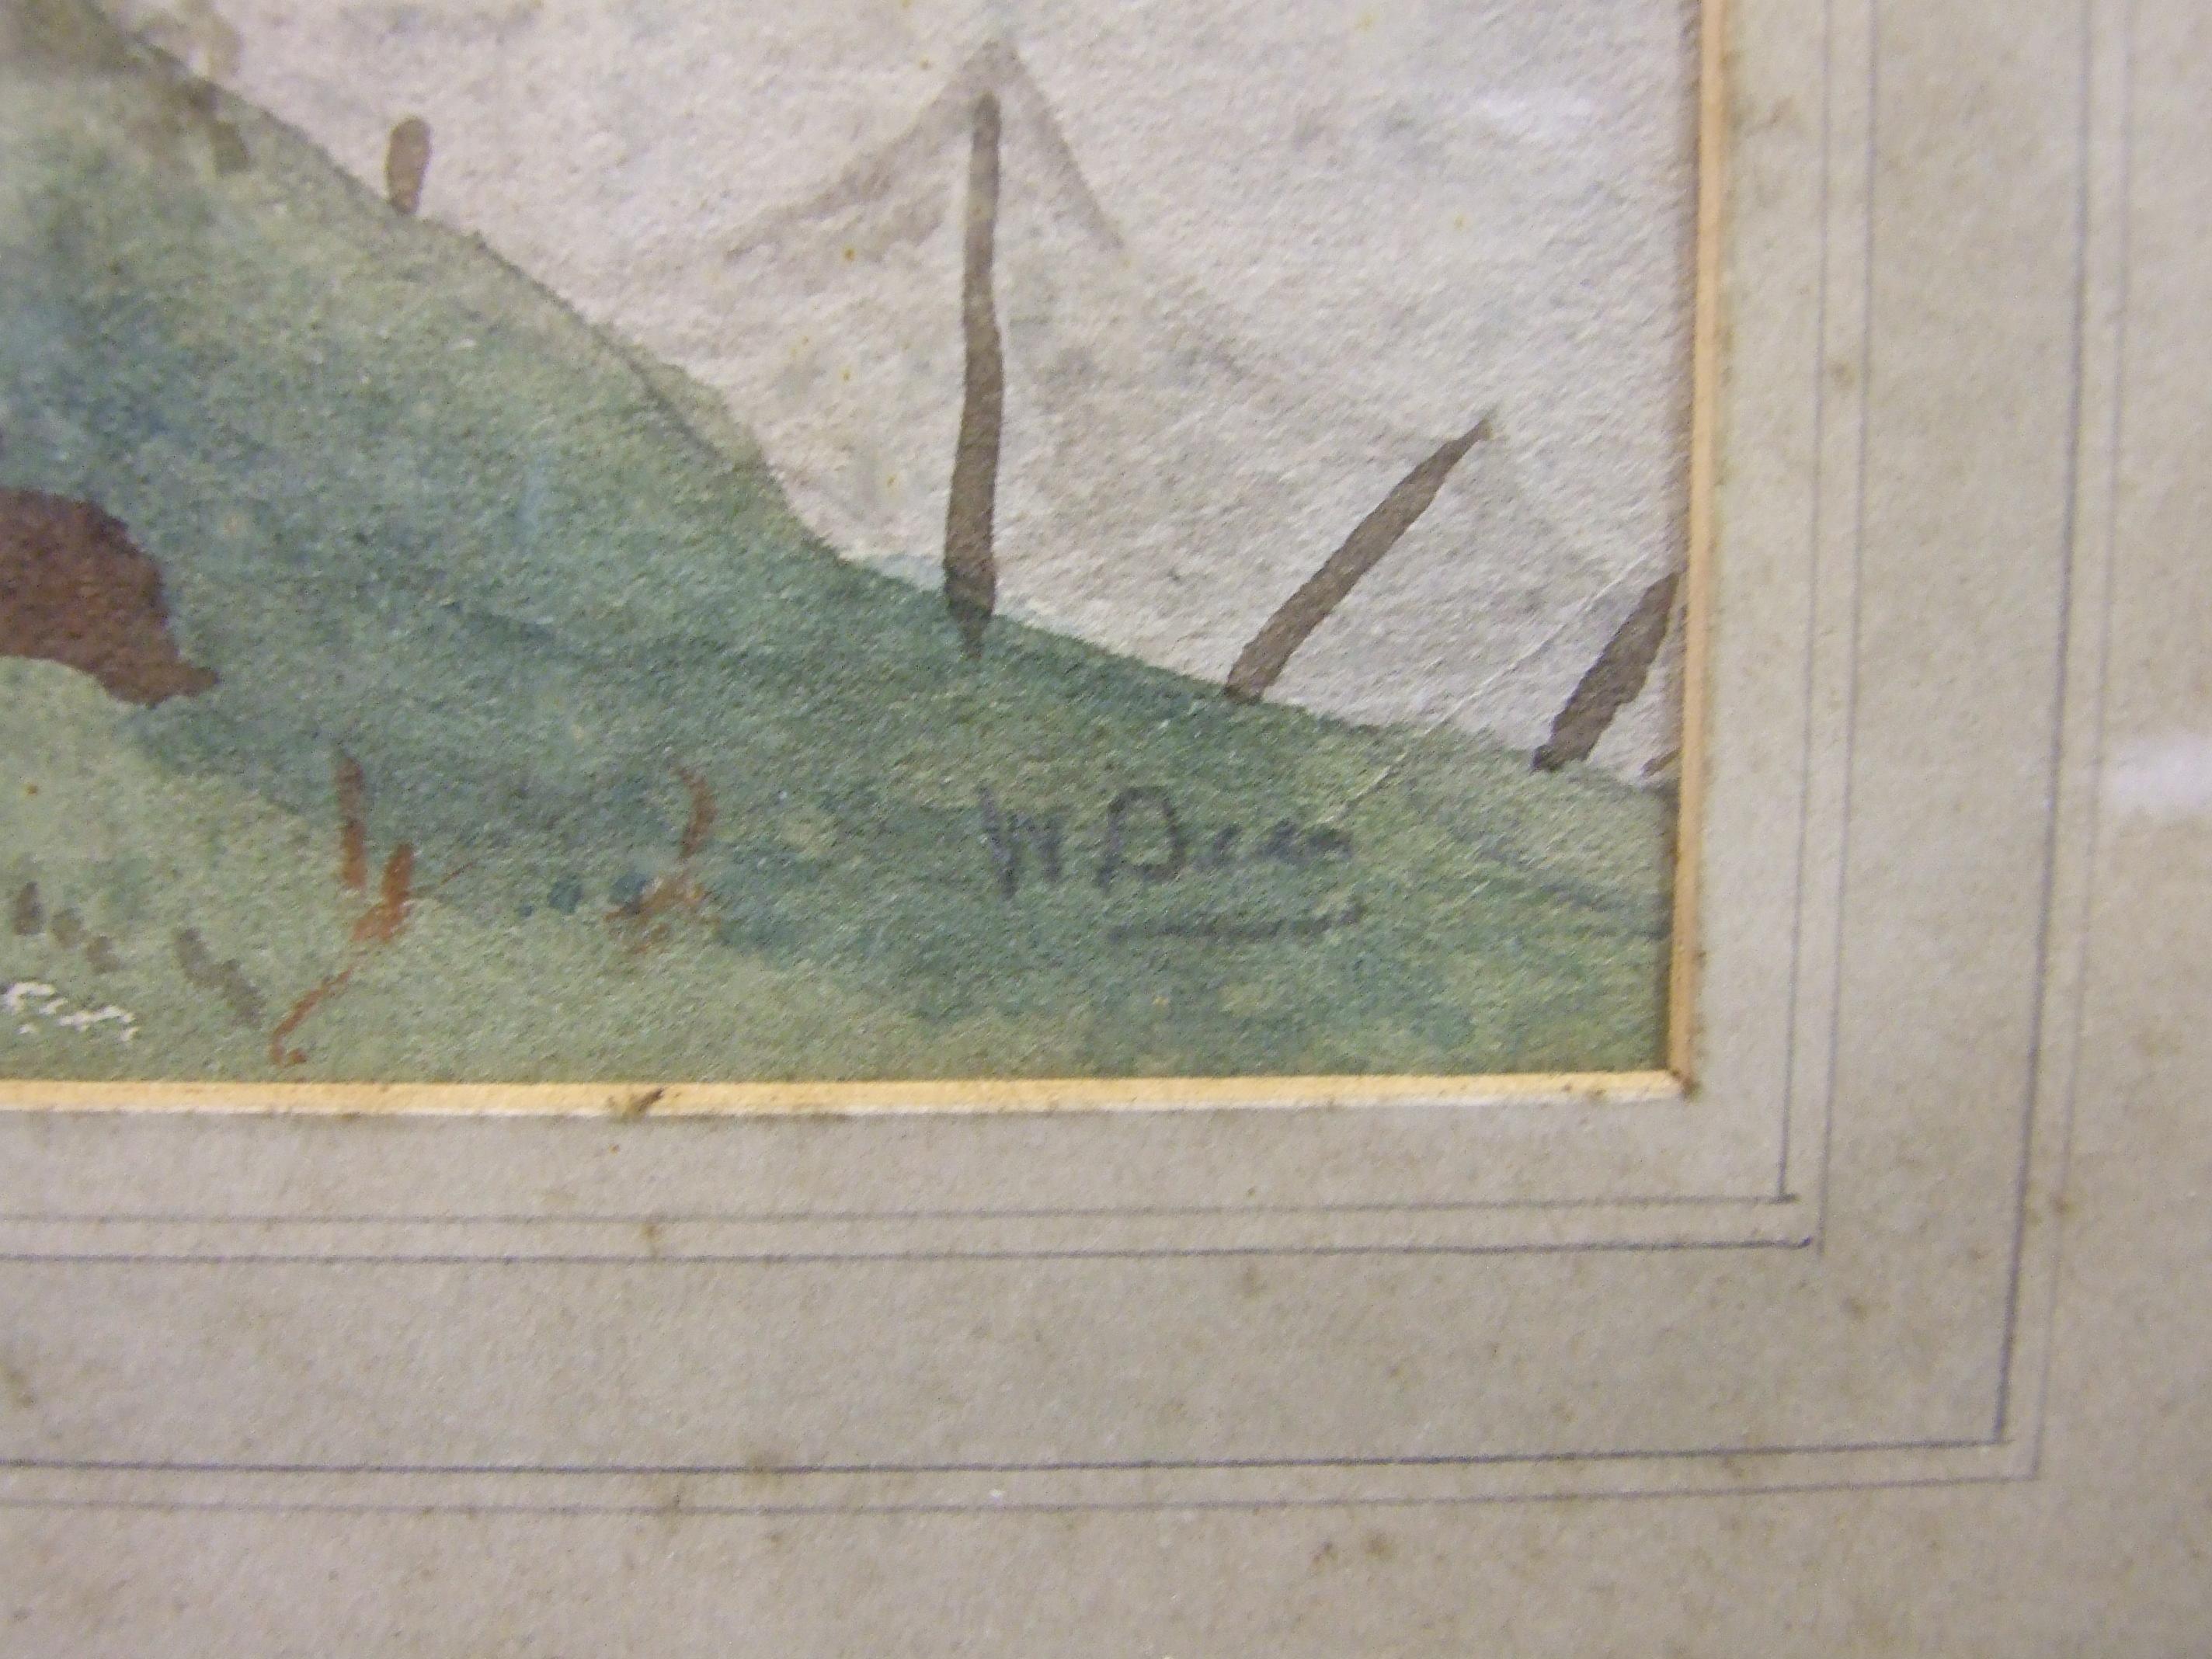 Lot 38 - W D** SCOTTISH CROFT Indistinctly-signed watercolour, 23 x 30cm.